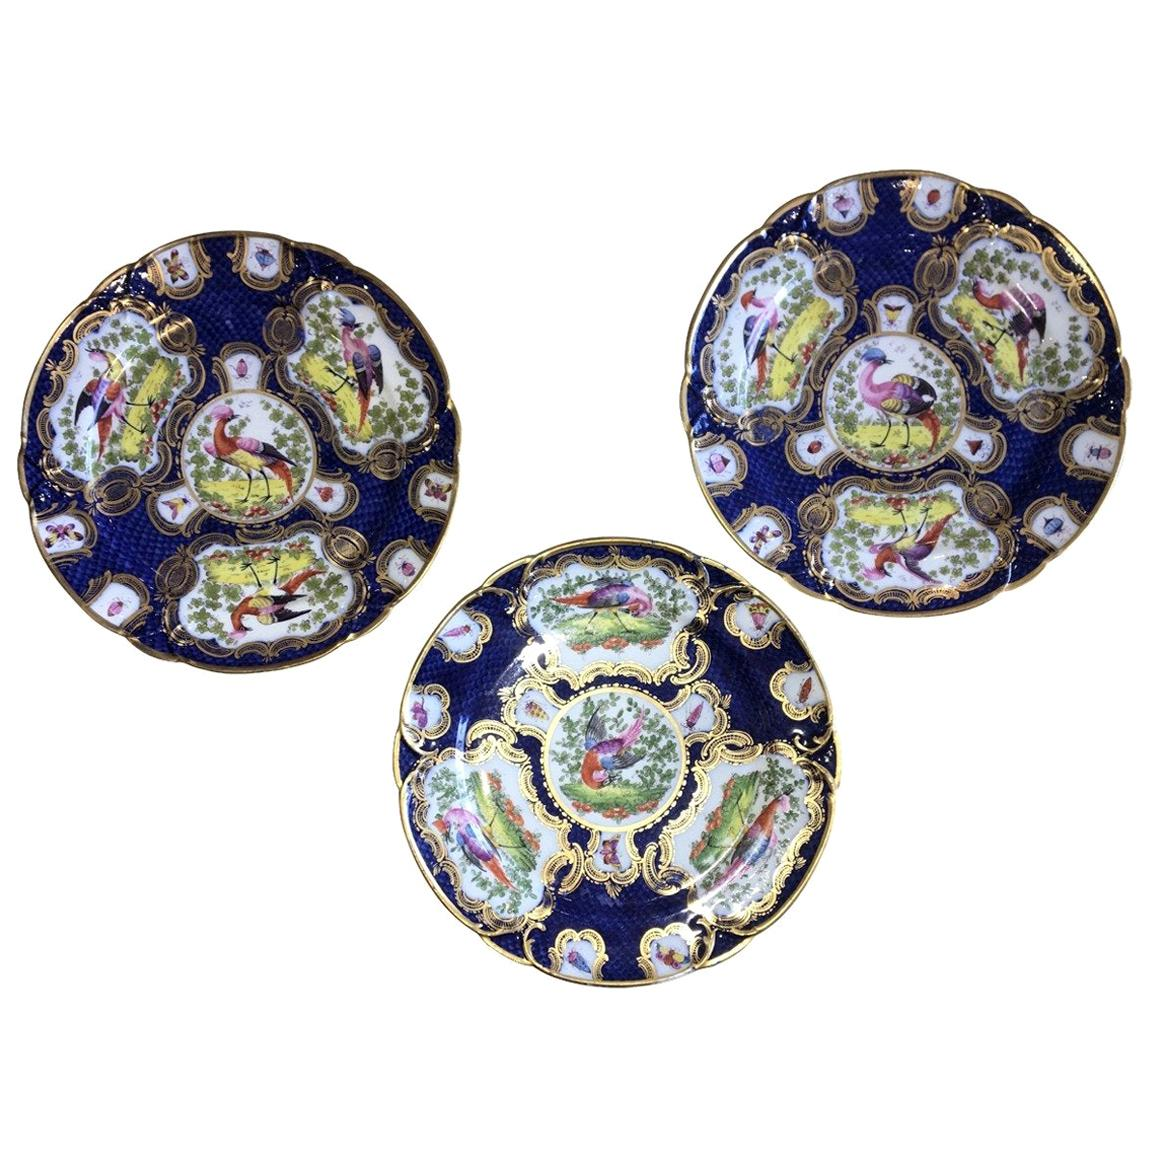 Chelsea Porcelain Cabinet Plates, Mid-18th Century